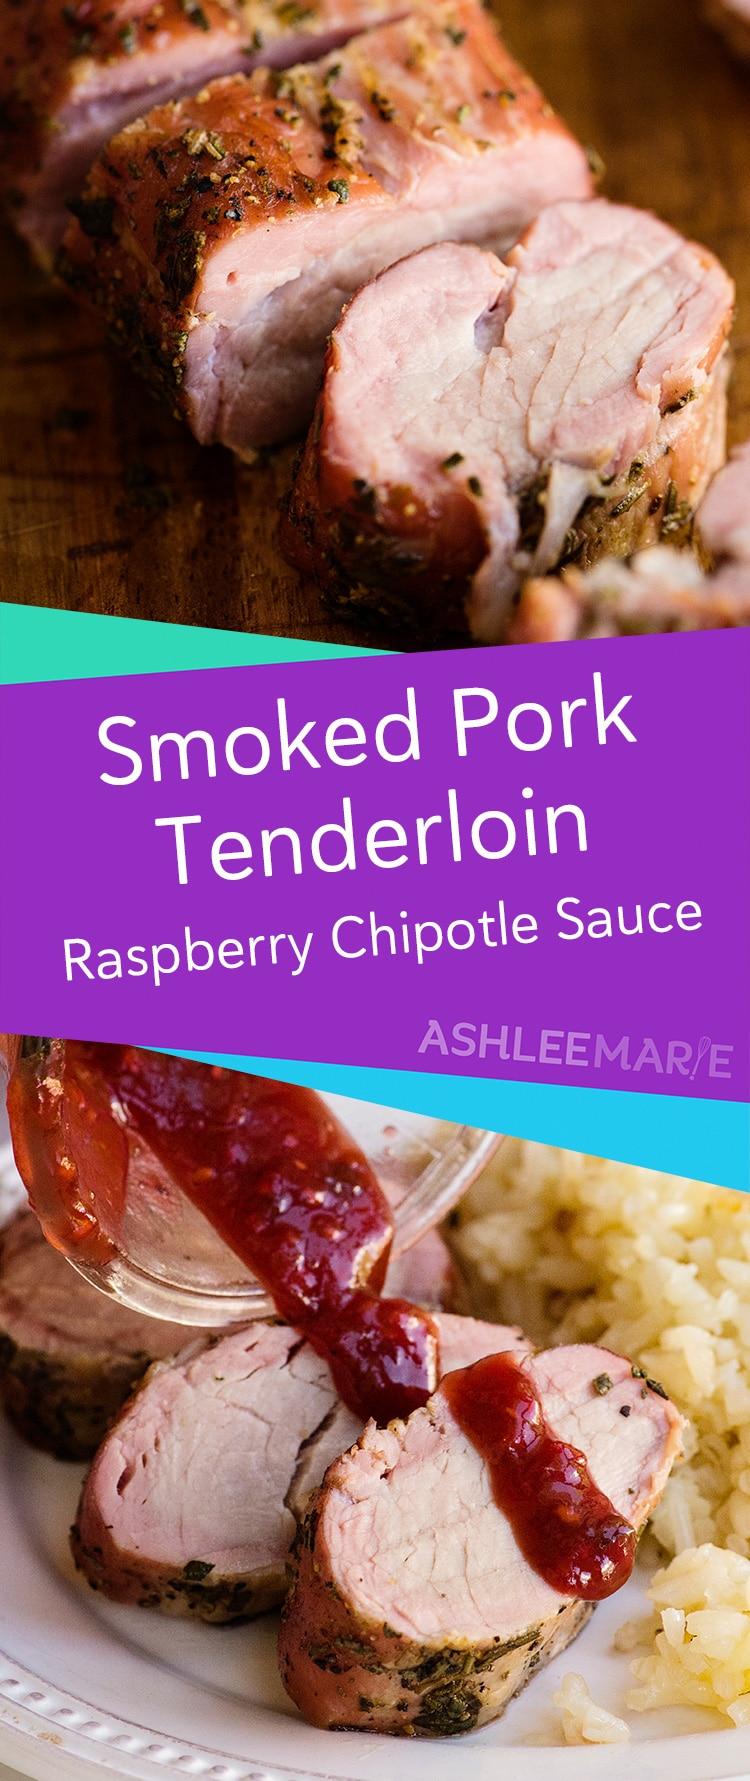 smoked-pork-tenderloin-recipe